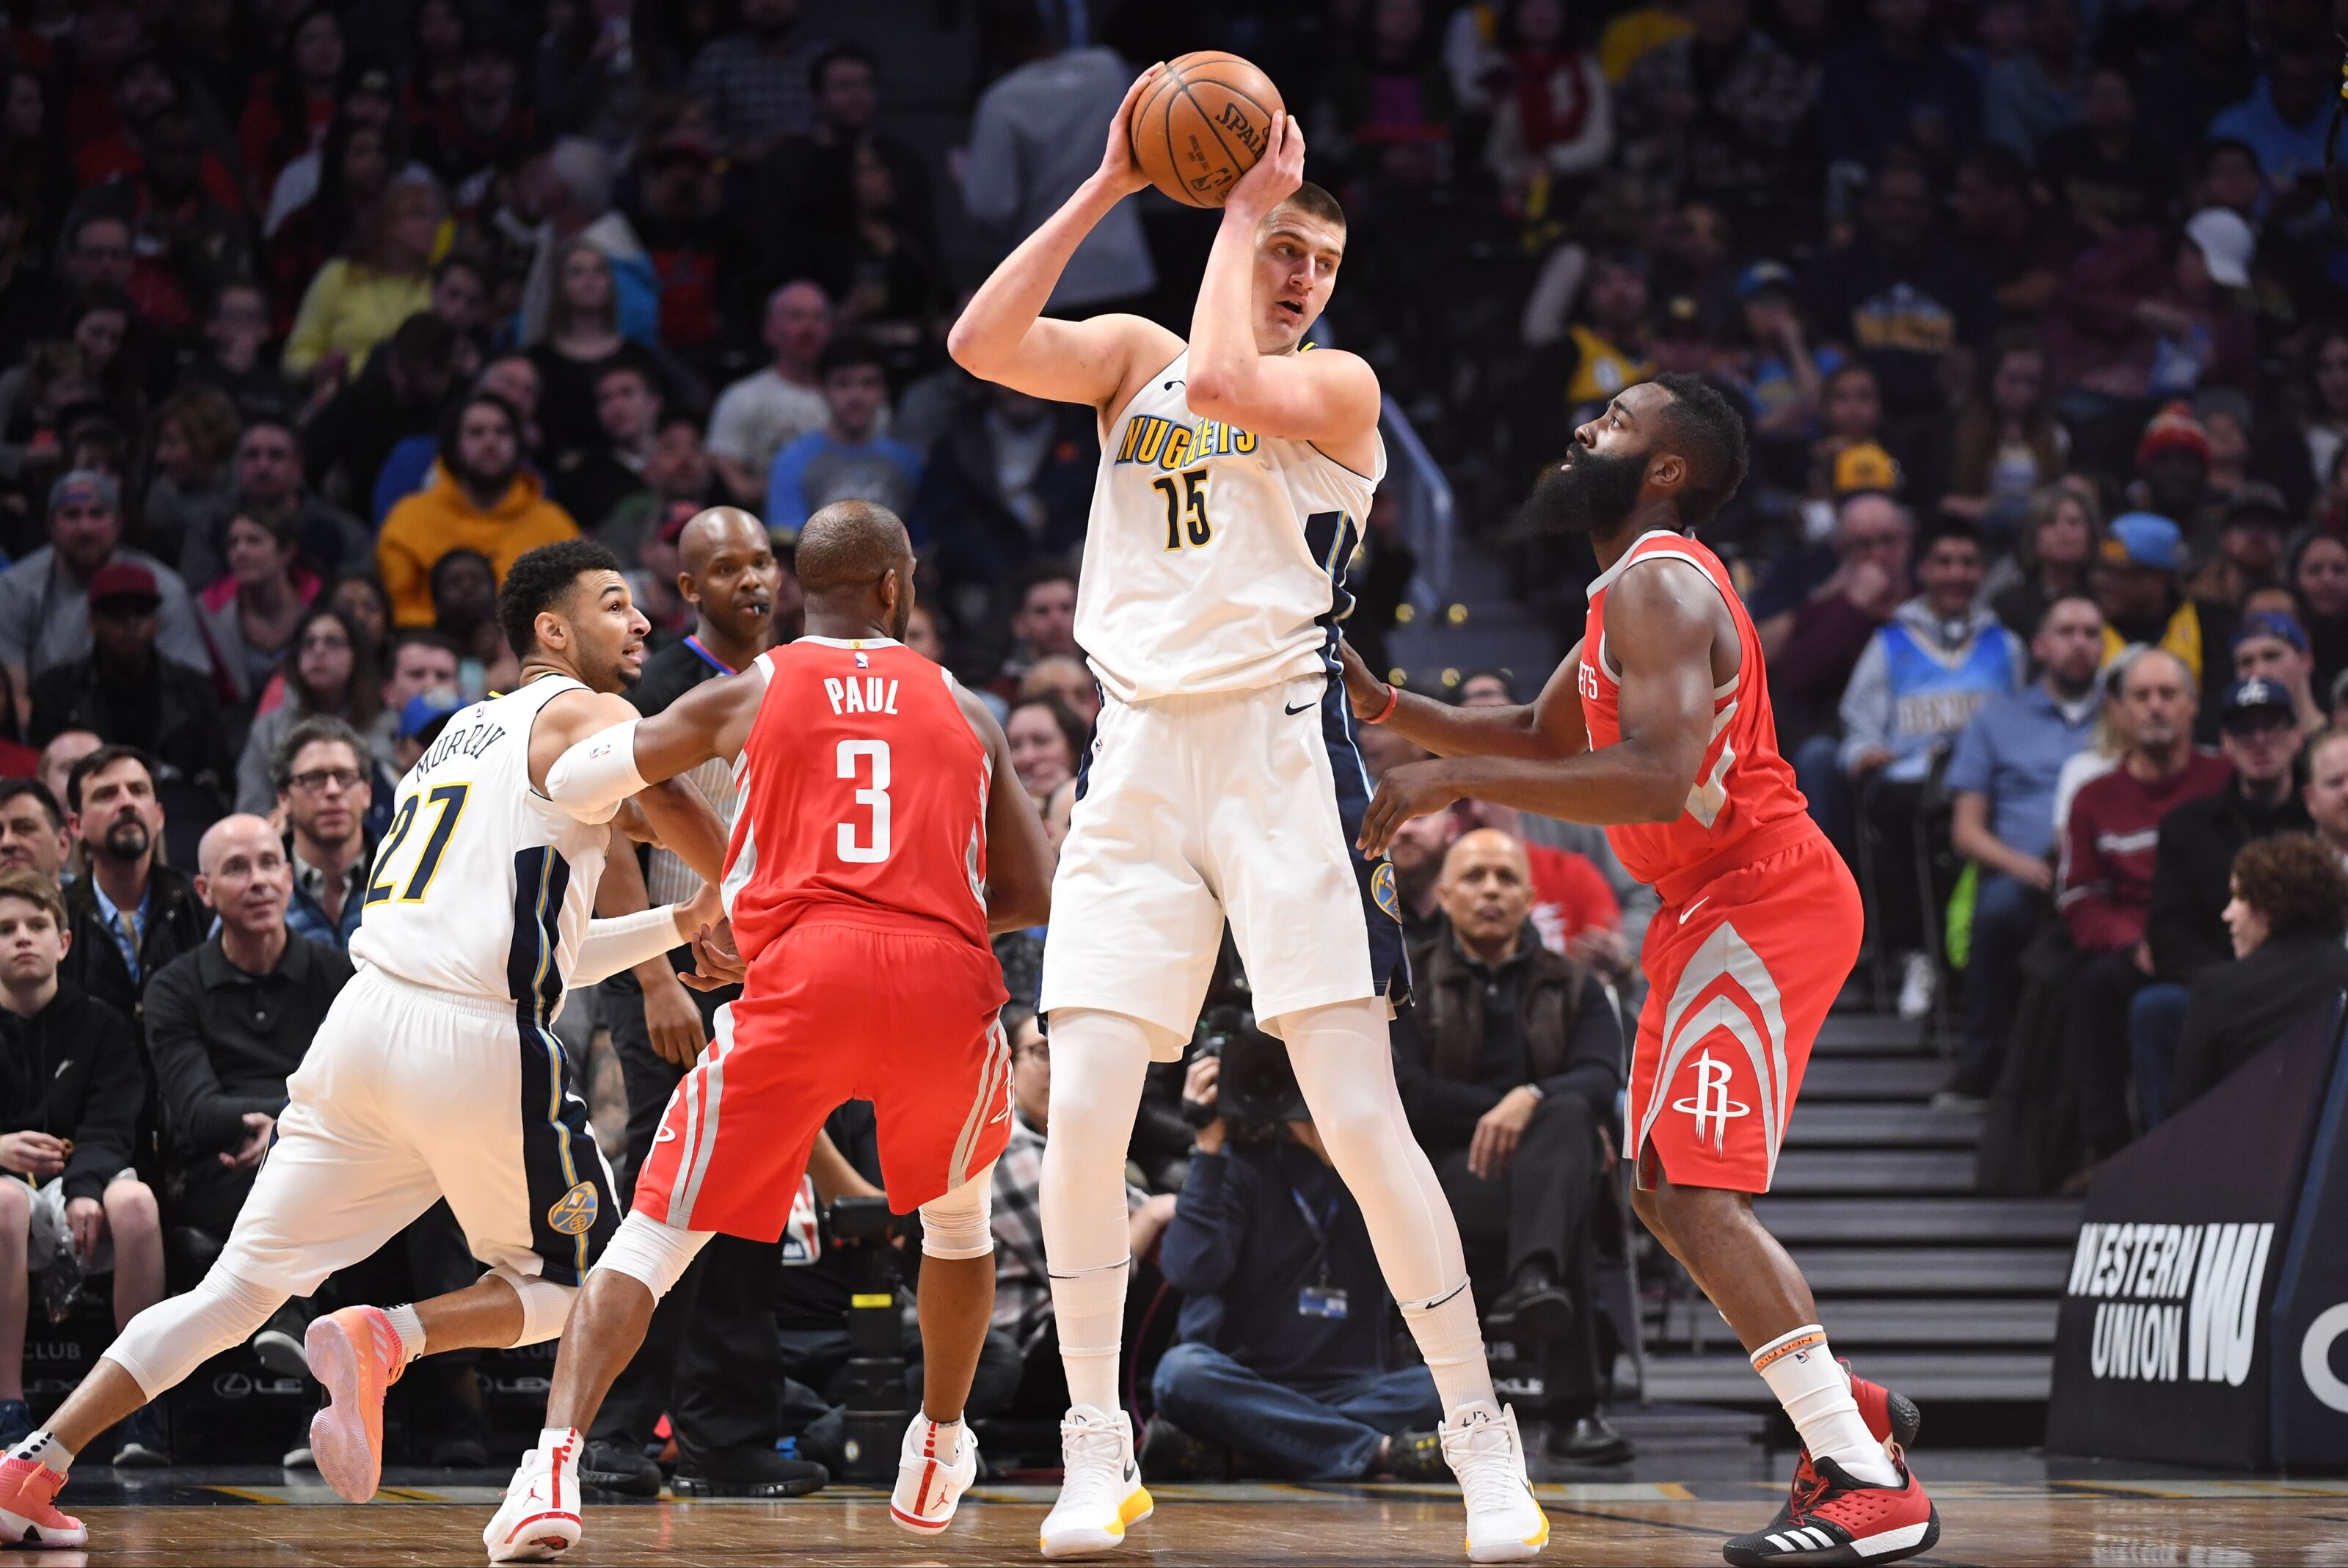 Denver Nuggets: Nikola Jokic is the best Center in the NBA